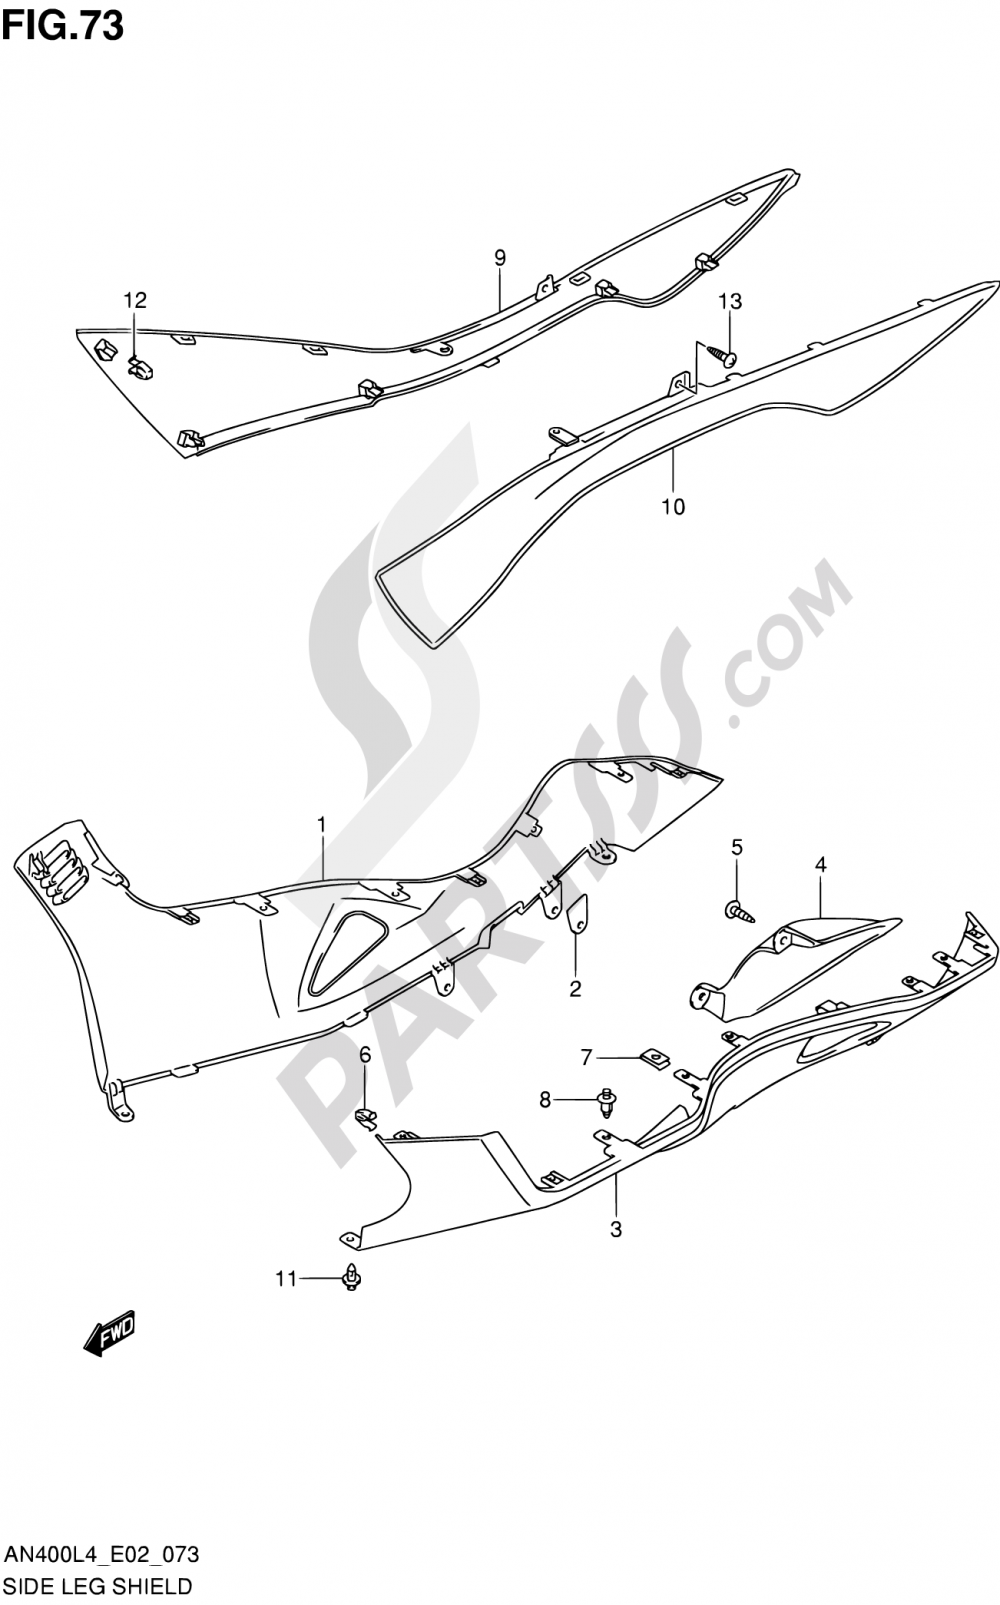 73 - SIDE LEG SHIELD (AN400AL4 E19) Suzuki BURGMAN AN400Z 2014